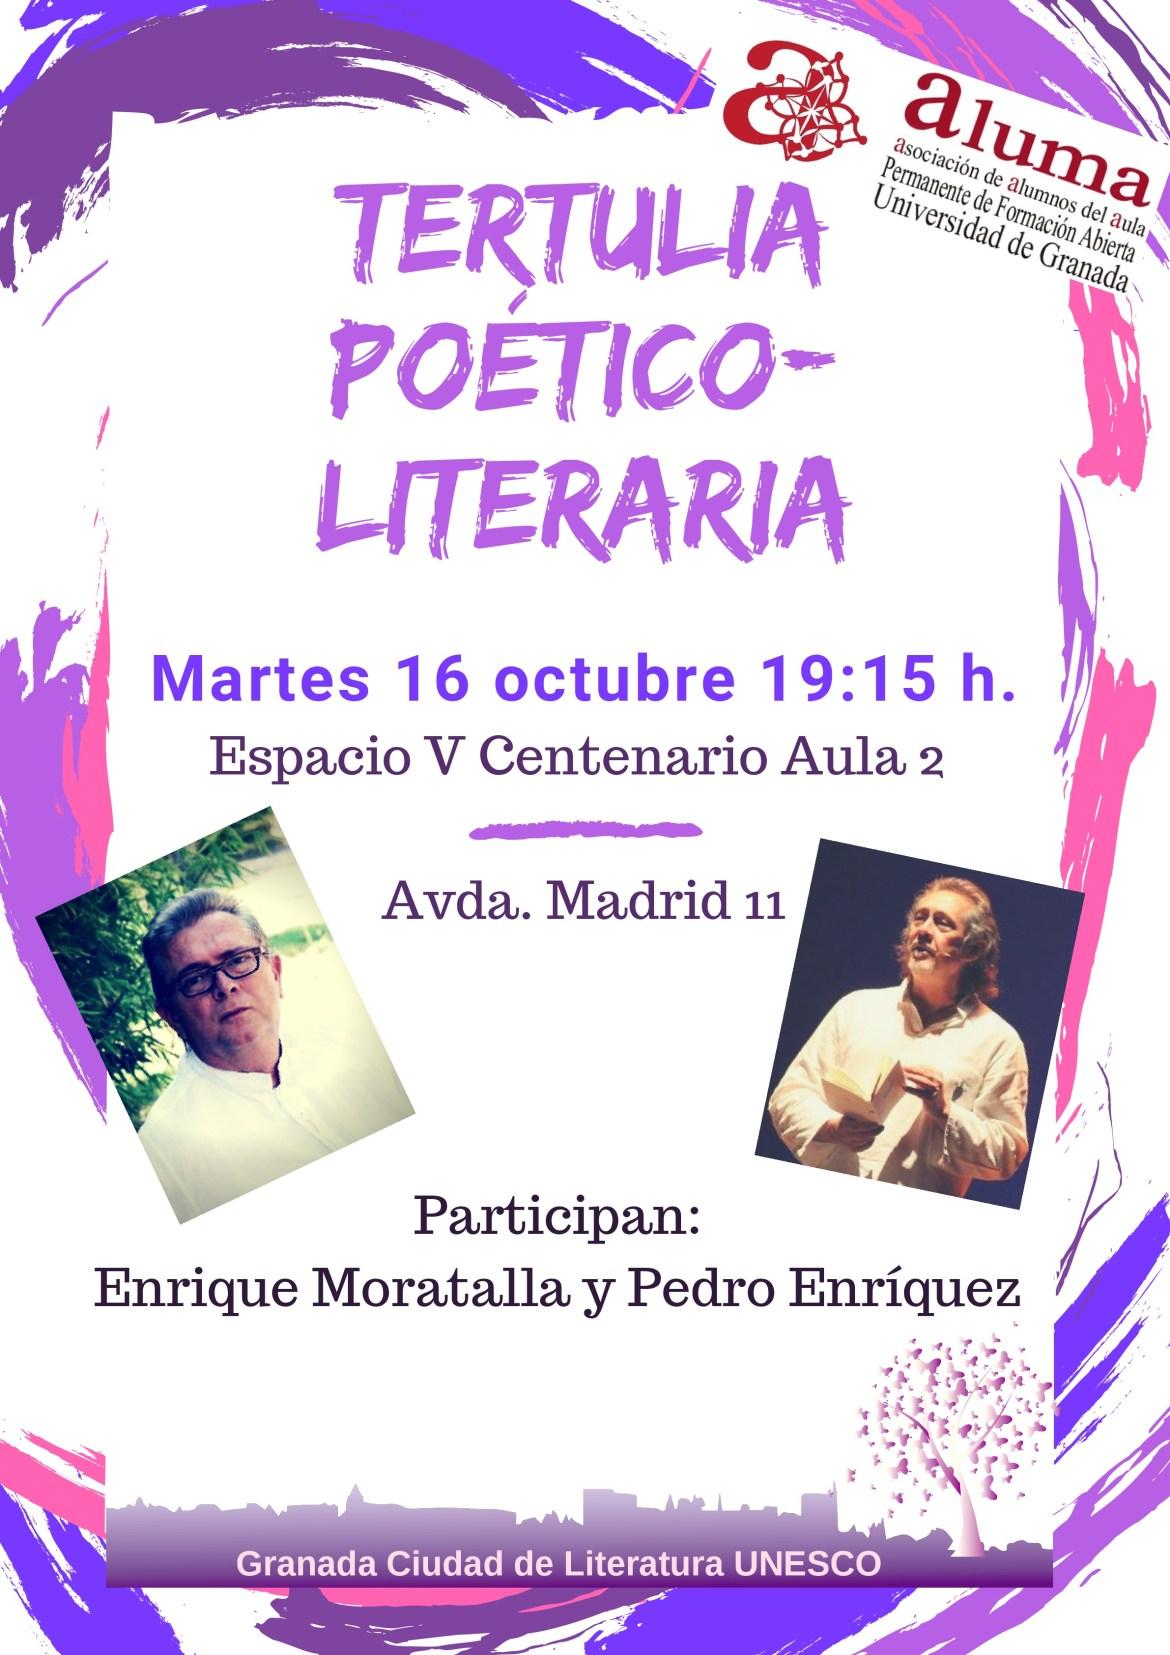 tertulia poético-literaria (2)-001